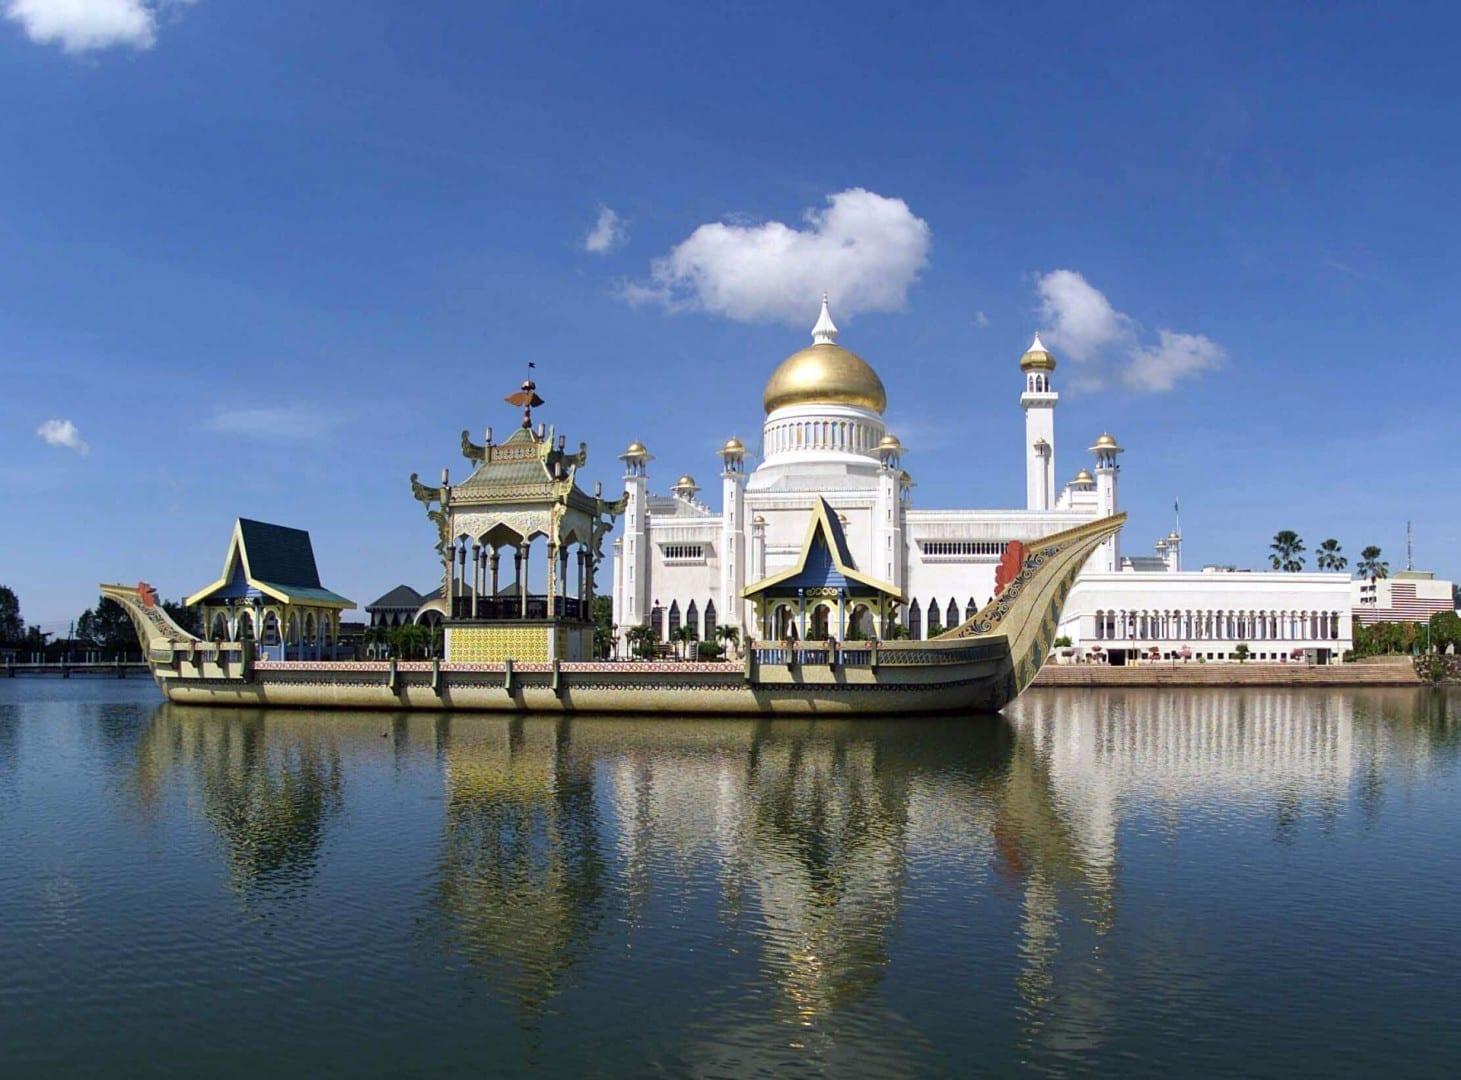 La mezquita del Sultán Omar Ali Saifuddien. Bandar Seri Begawan Brunei